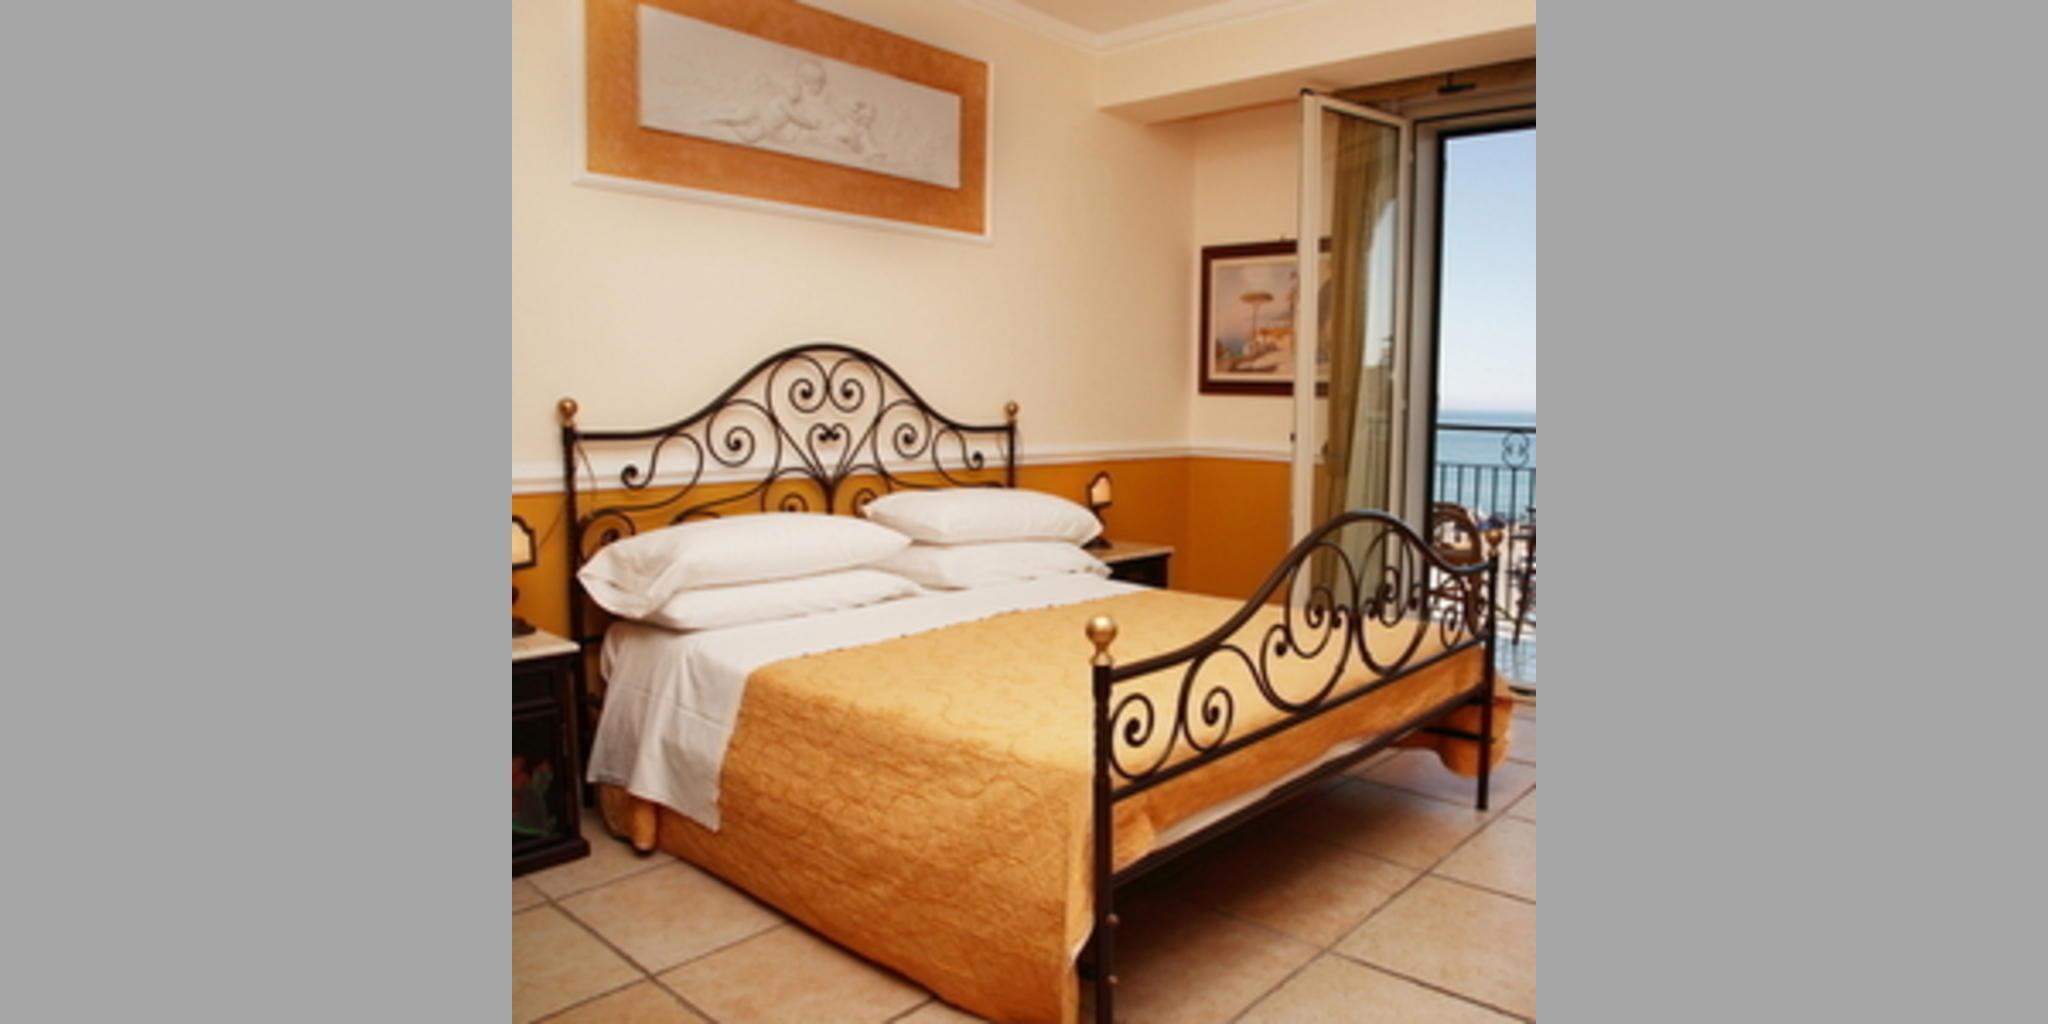 Bed & Breakfast Giardini naxos - Recanati